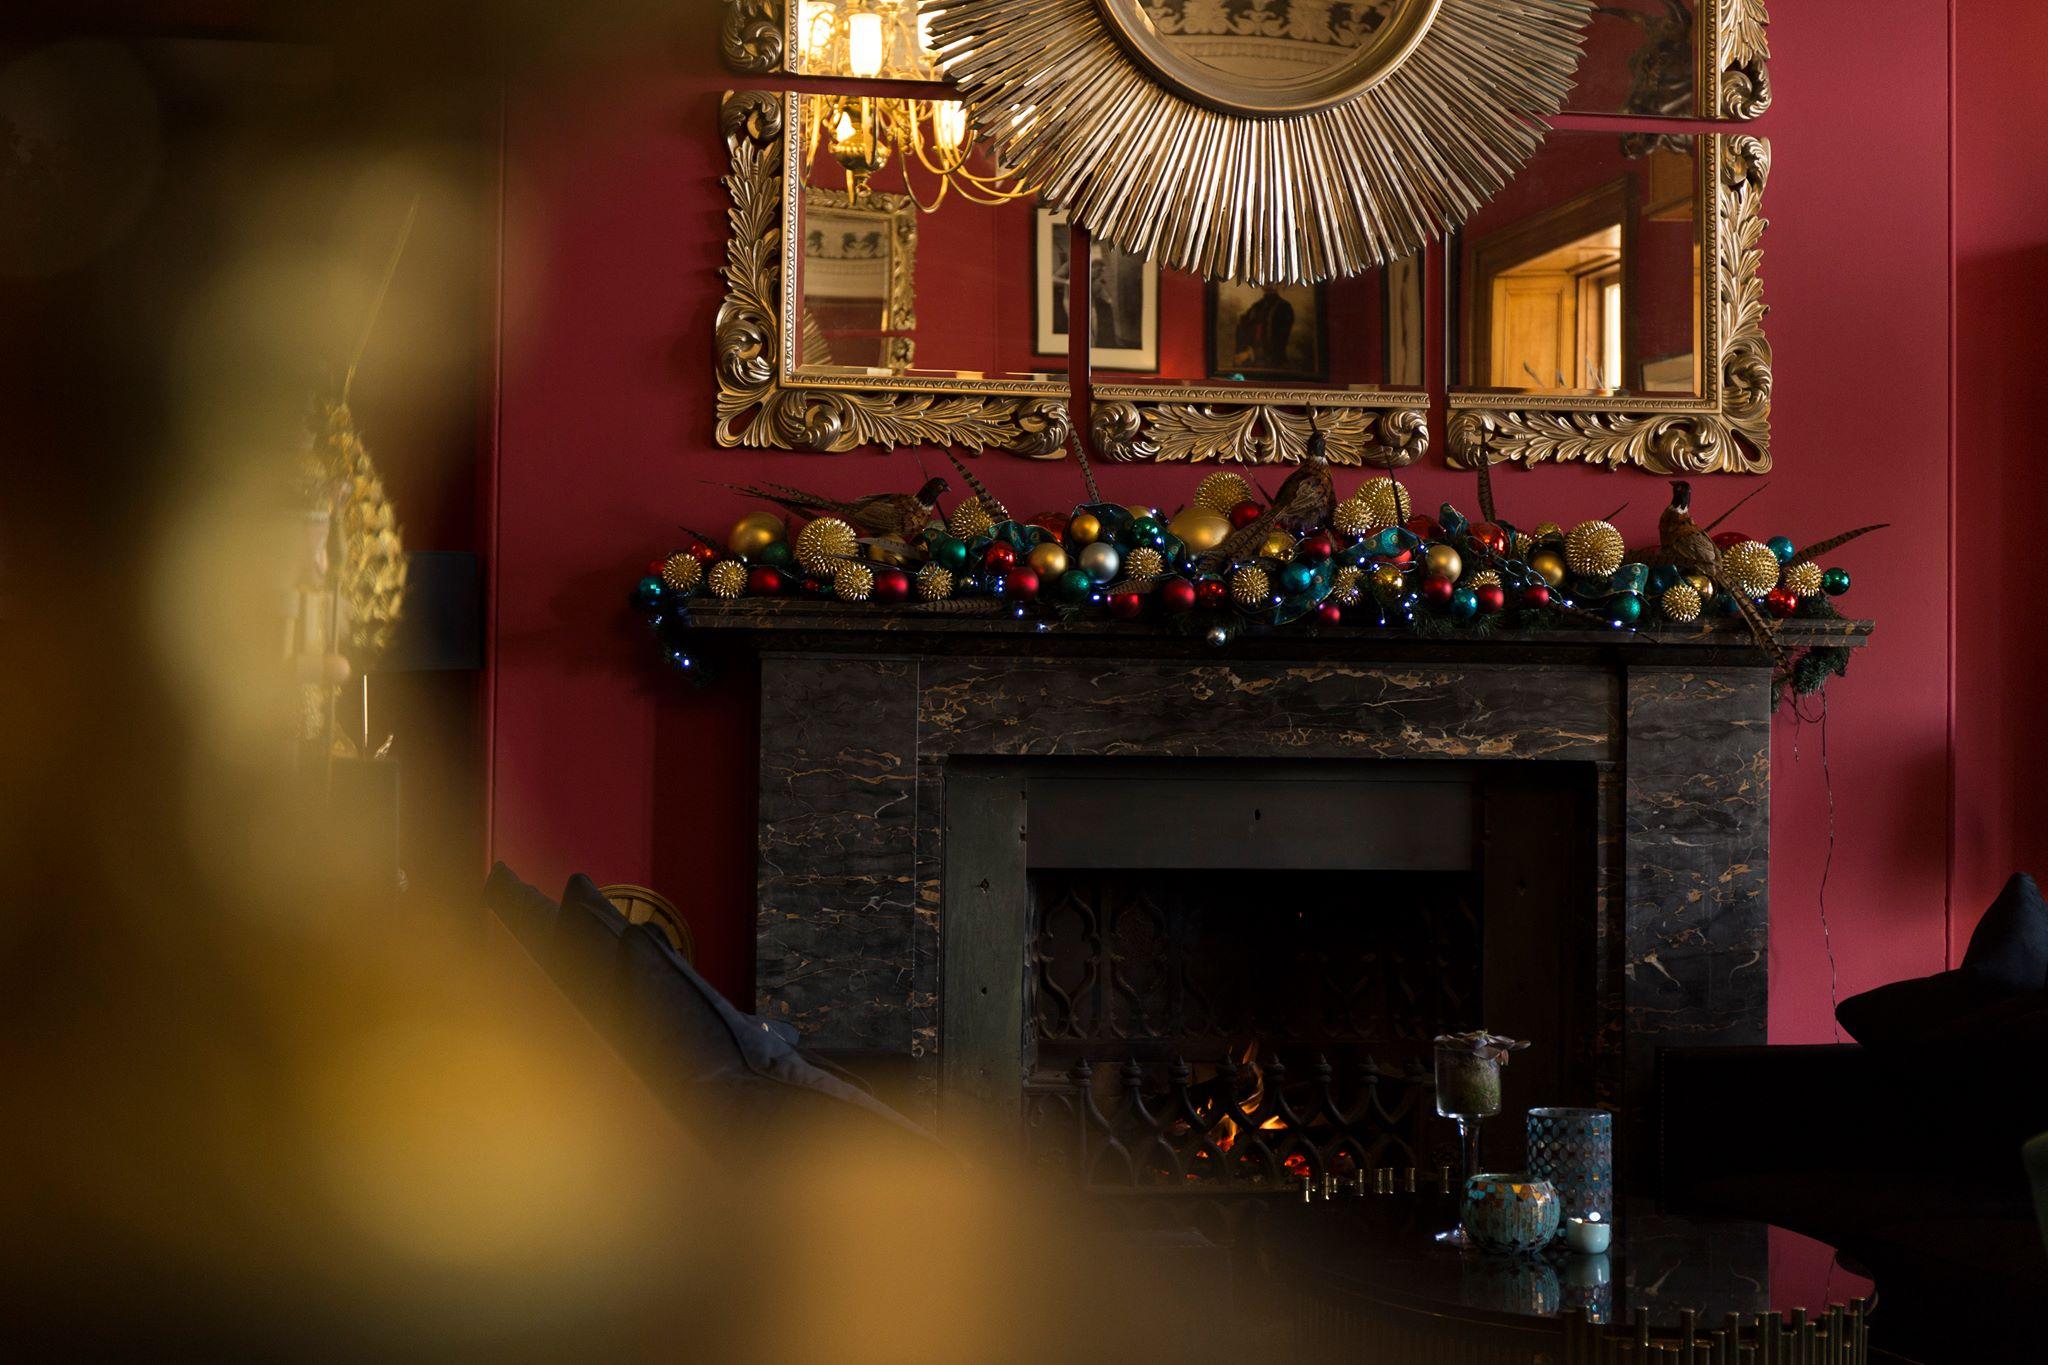 Haigh Hall Christmas Decorations